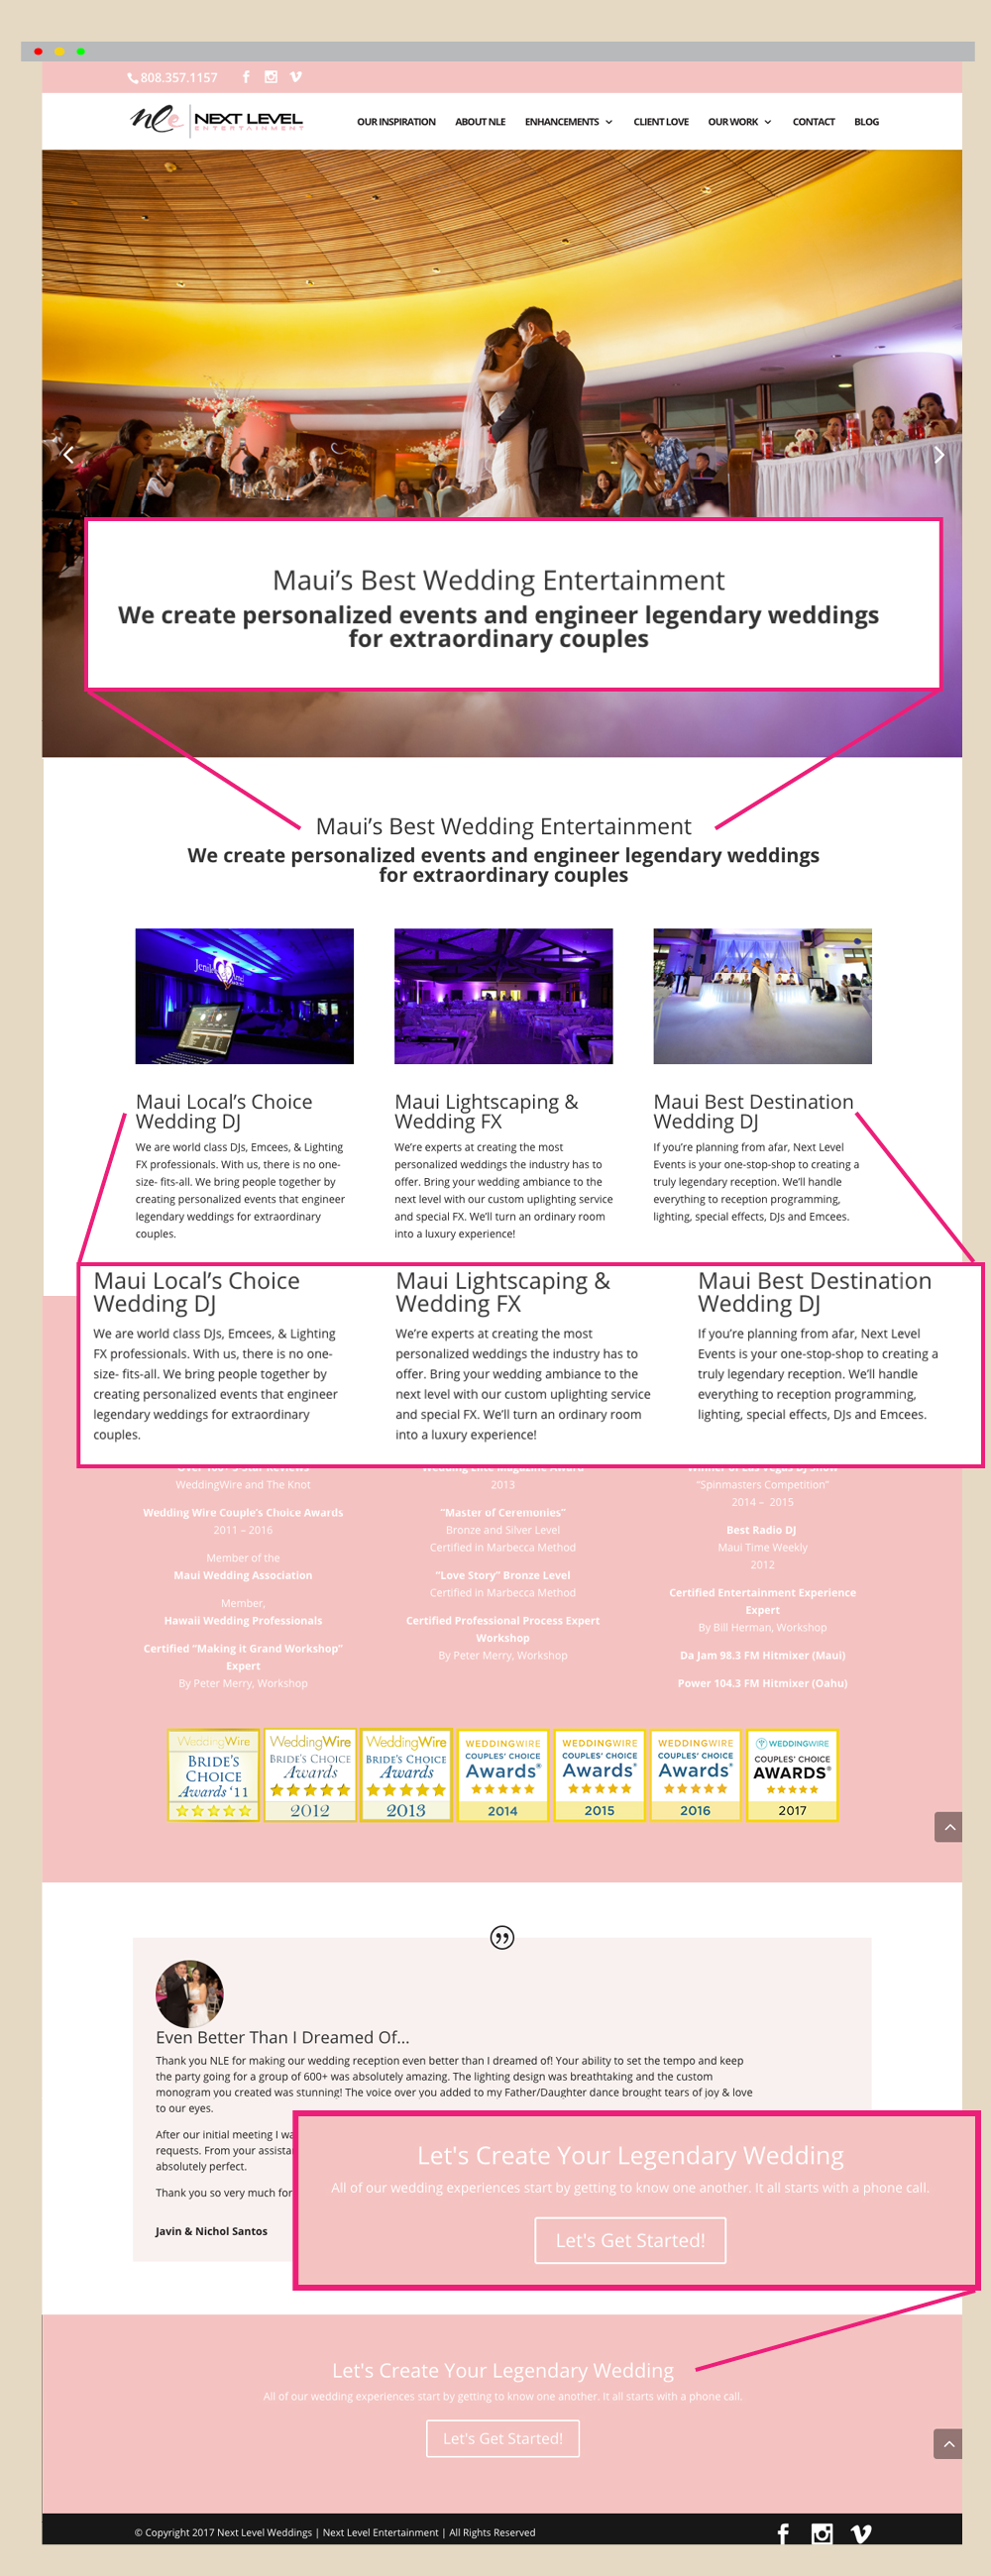 Primd Marketing - Case Study - Next Level Entertainment